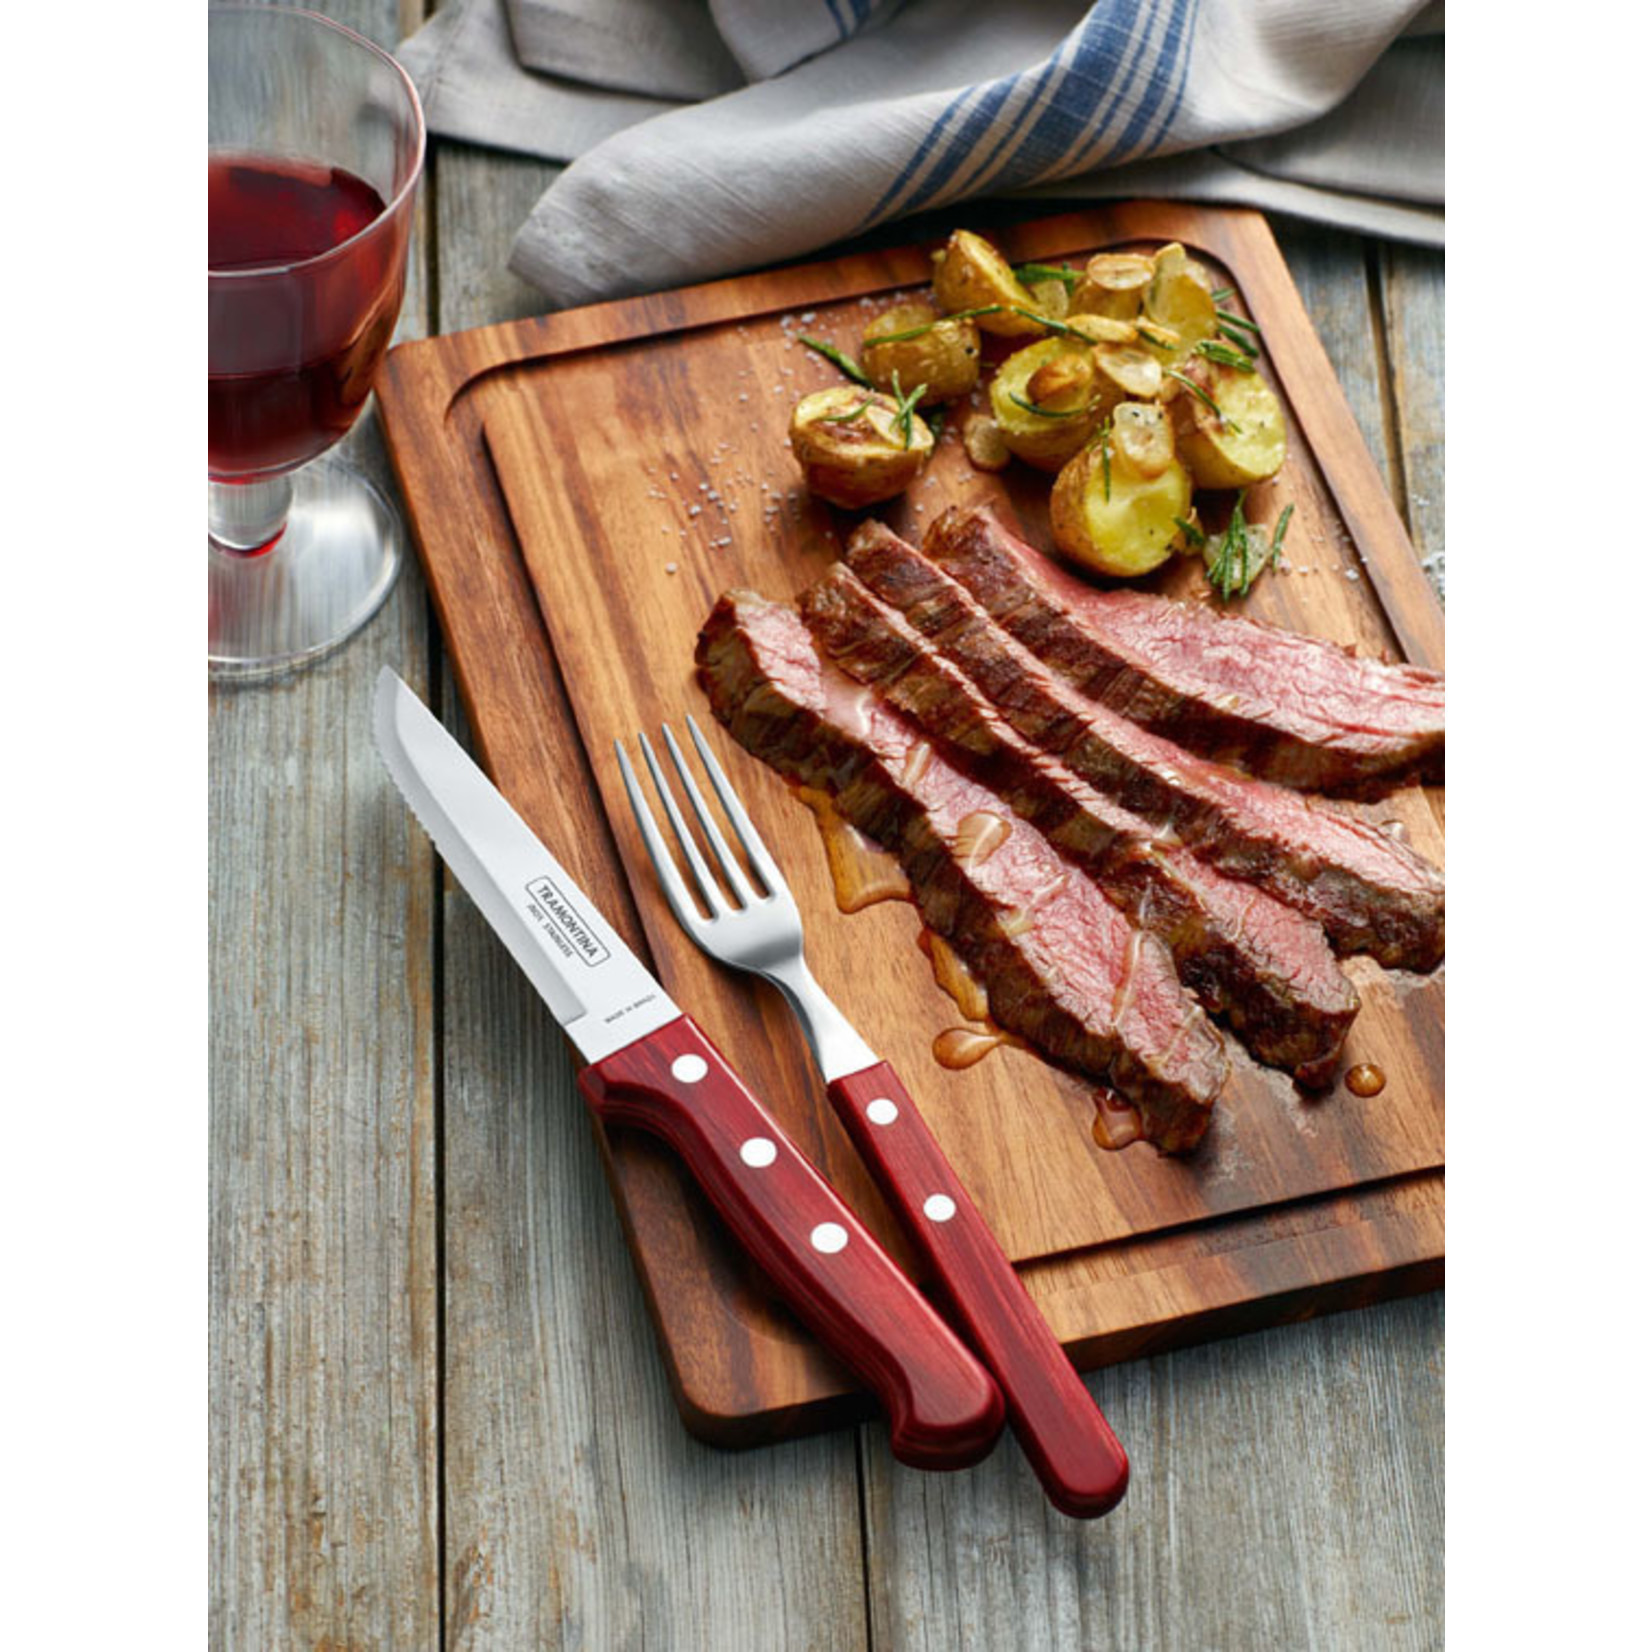 Tramontina Tramontina Churrasco steakmessenset Gaucho 6-delig rood